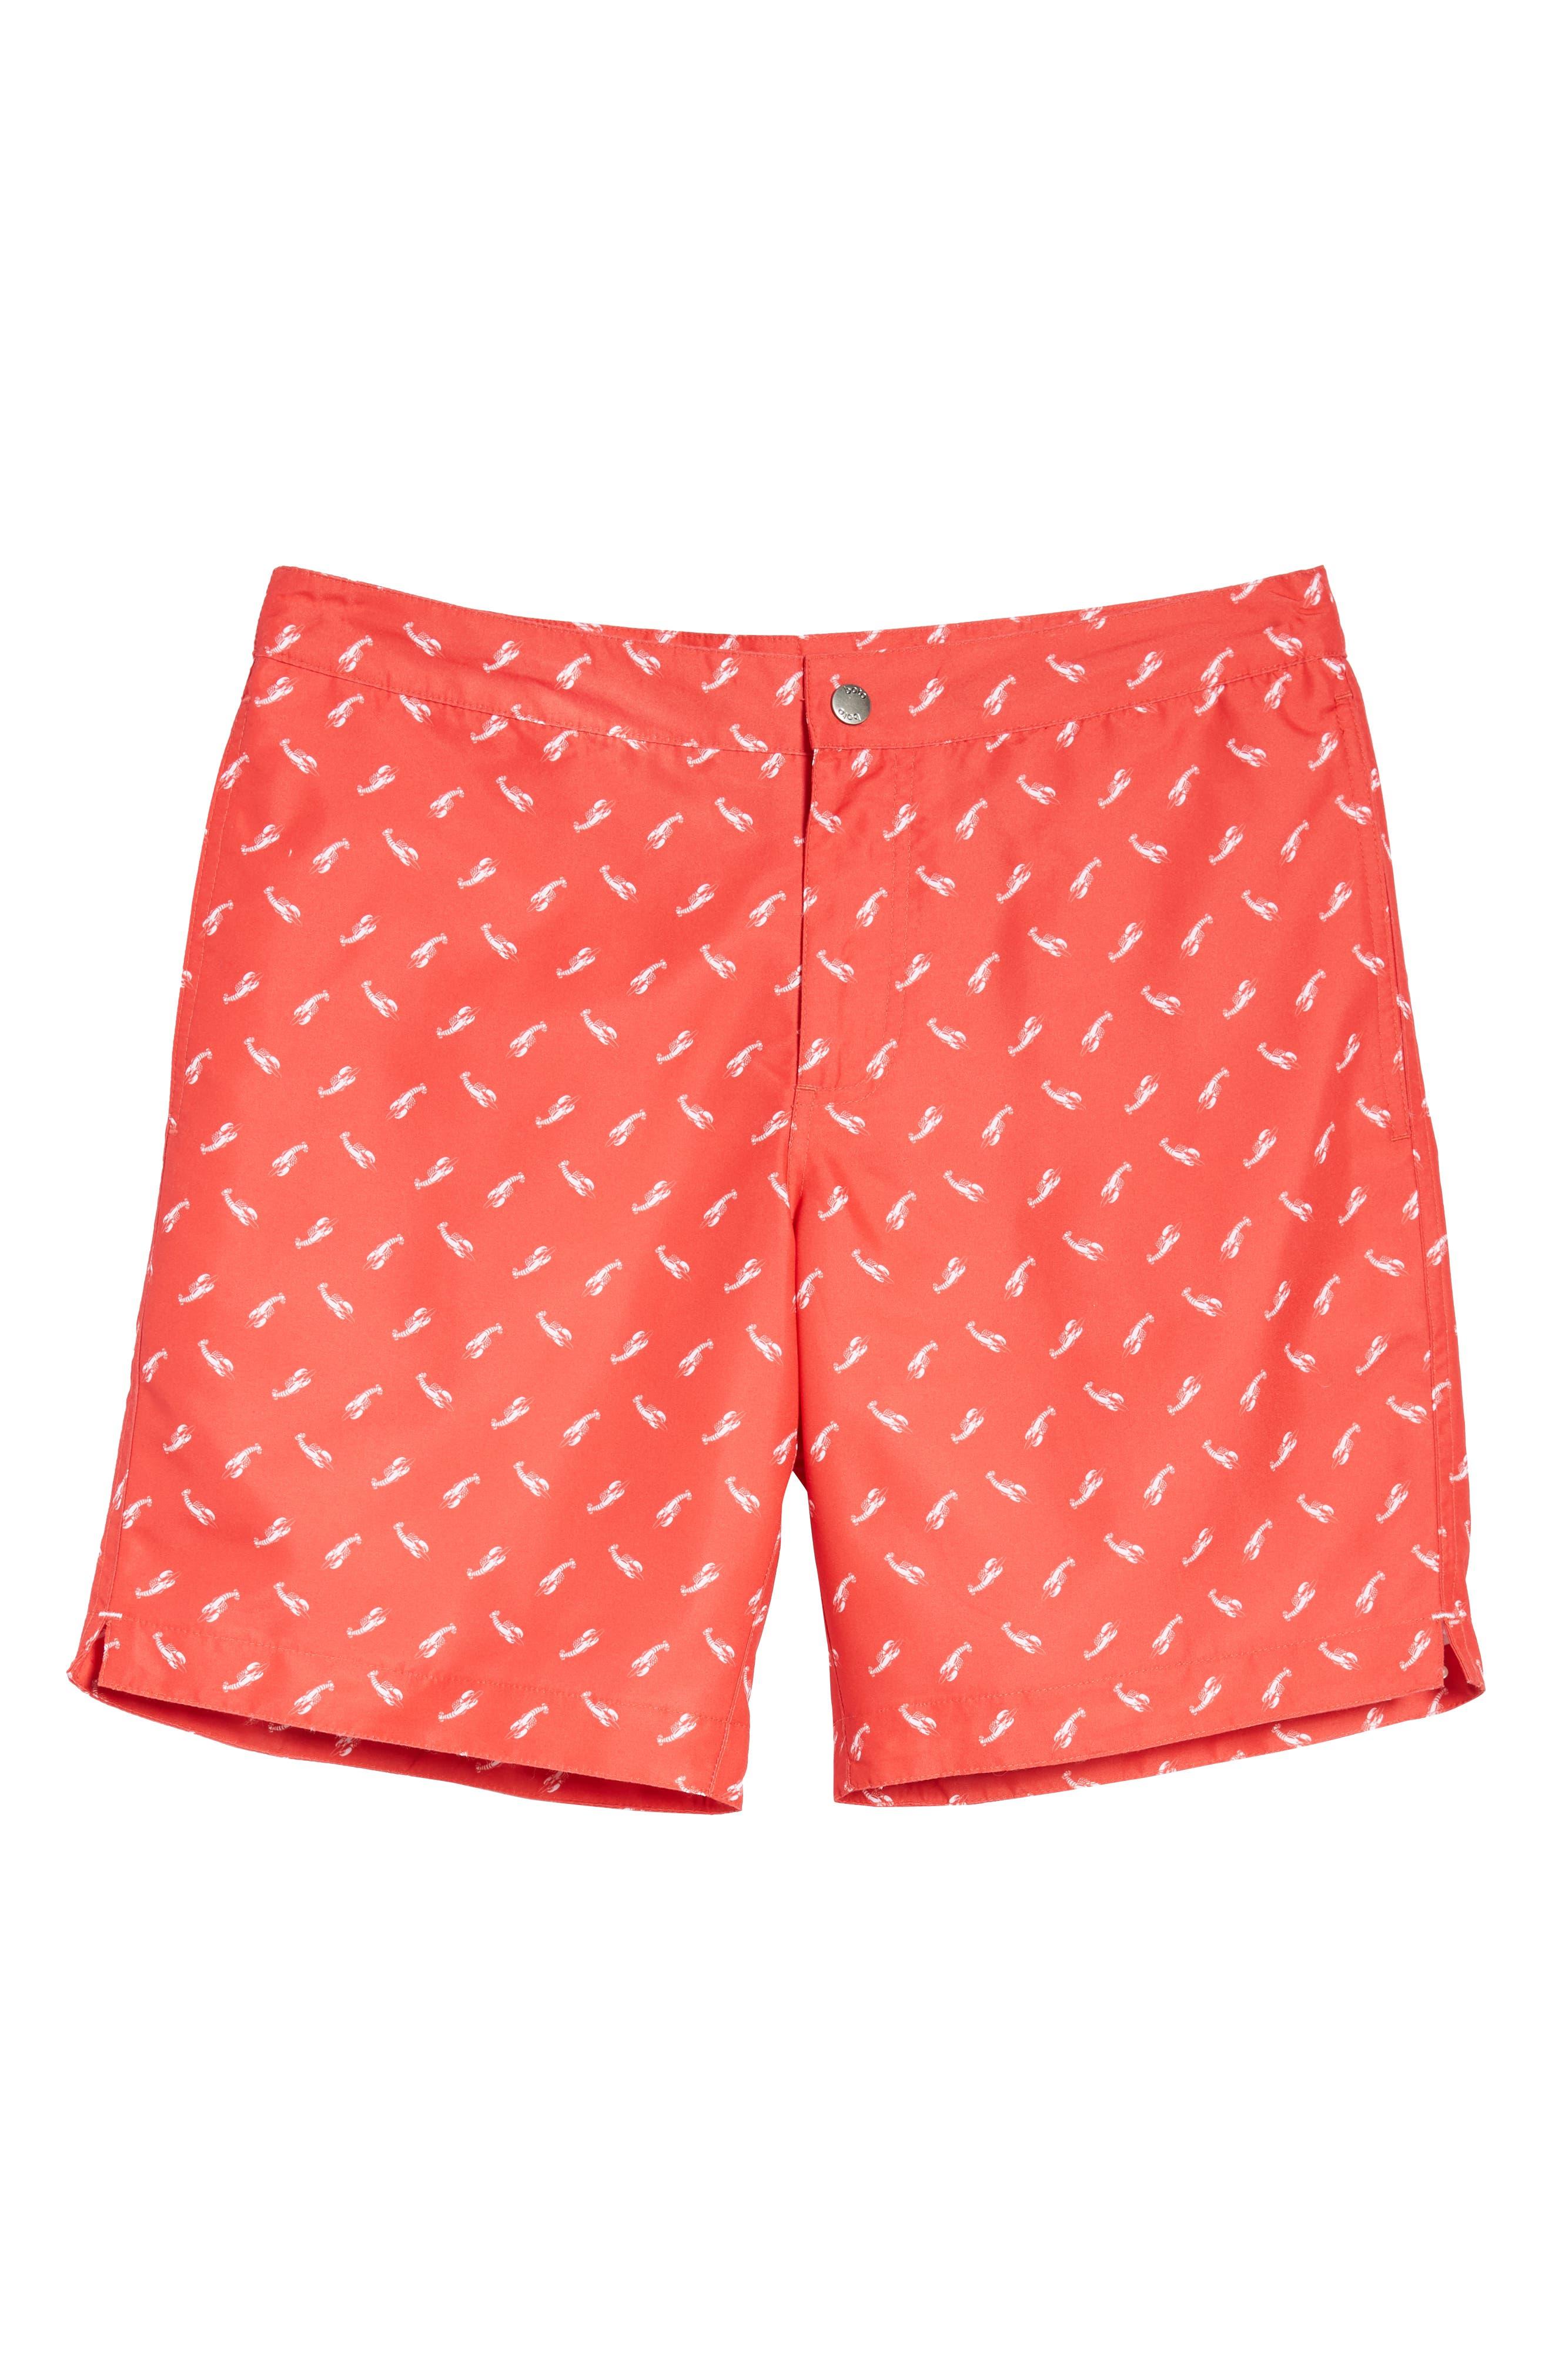 Aruba Slim Fit Swim Trunks,                             Alternate thumbnail 6, color,                             Red Lobsters Print